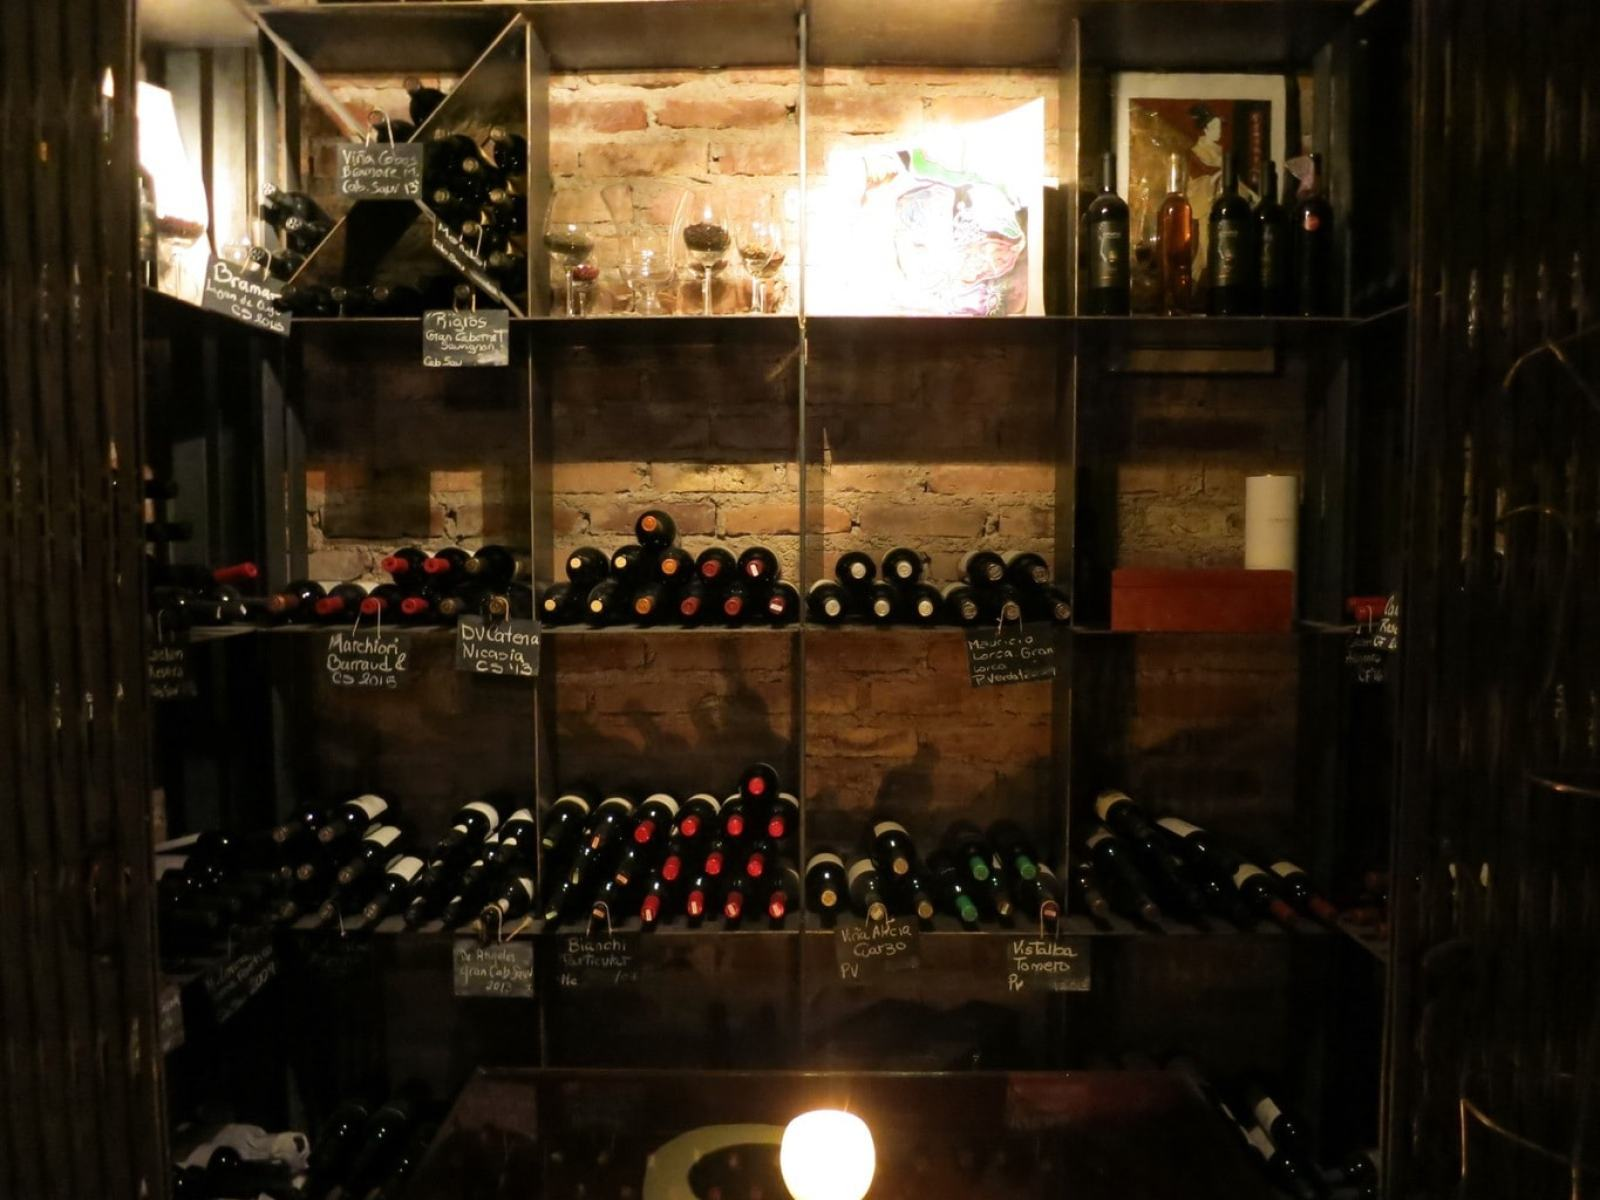 Stocked wine bottles Cavas Wine Lodge Mendoza Argentina